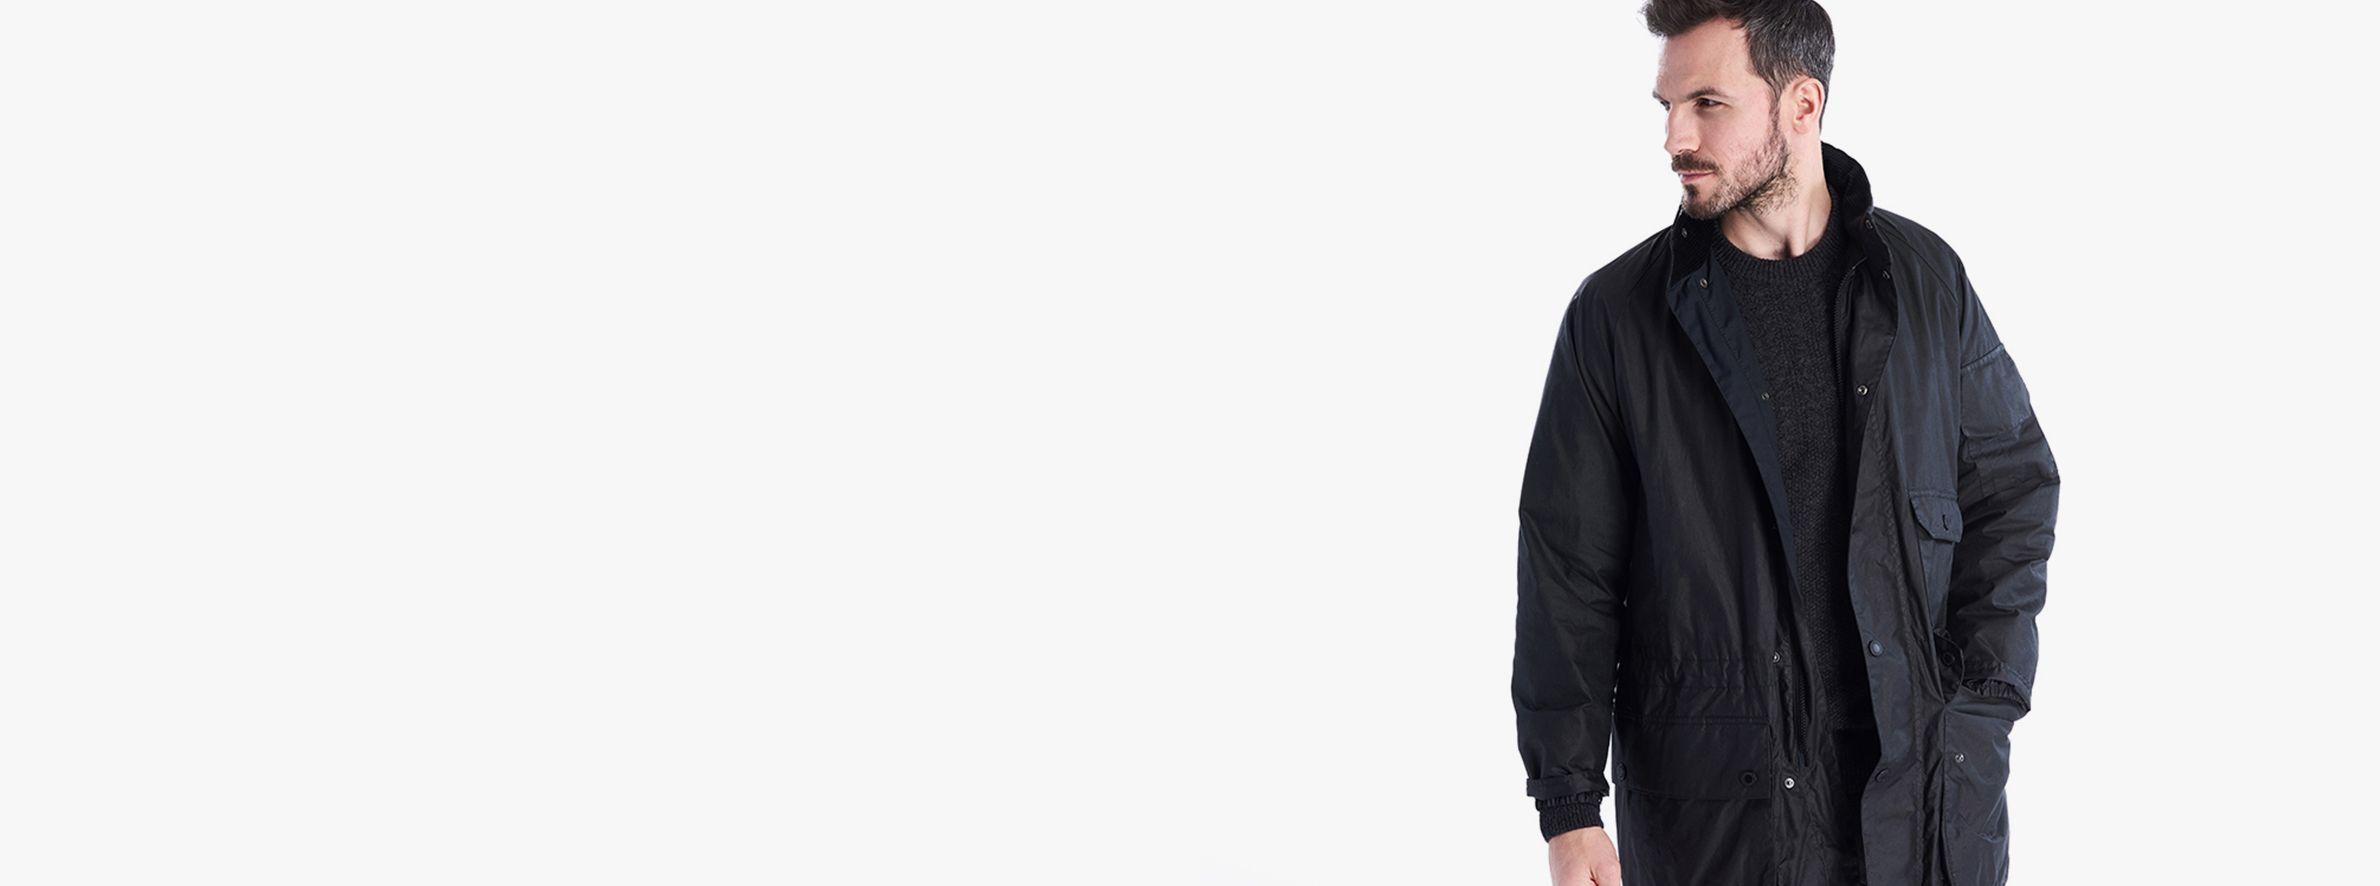 e87a131d Men's Jackets & Coats | Leather, Blazer, Bomber, Linen ...